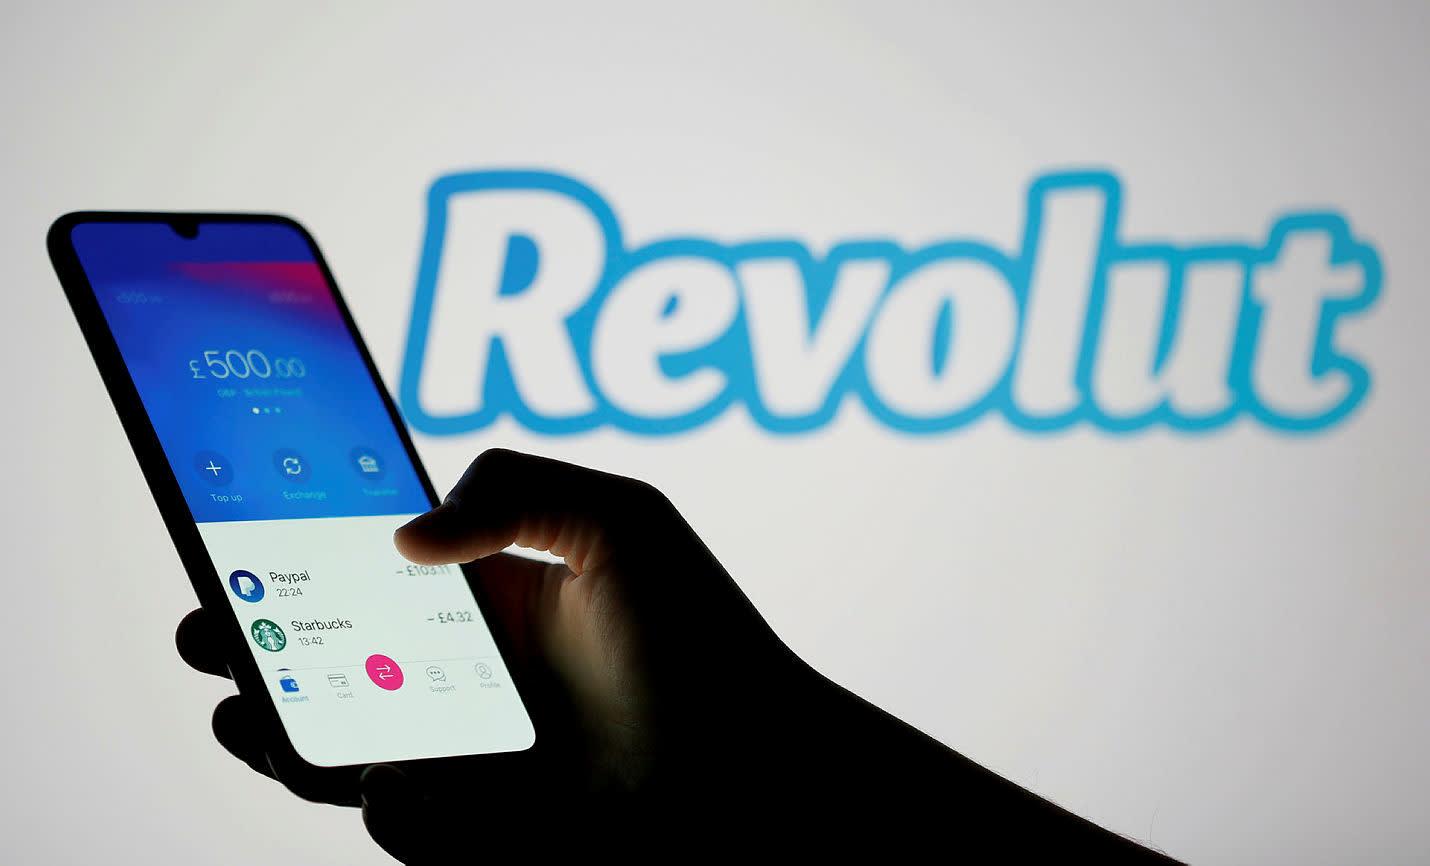 Revolut bags $33bn valuation